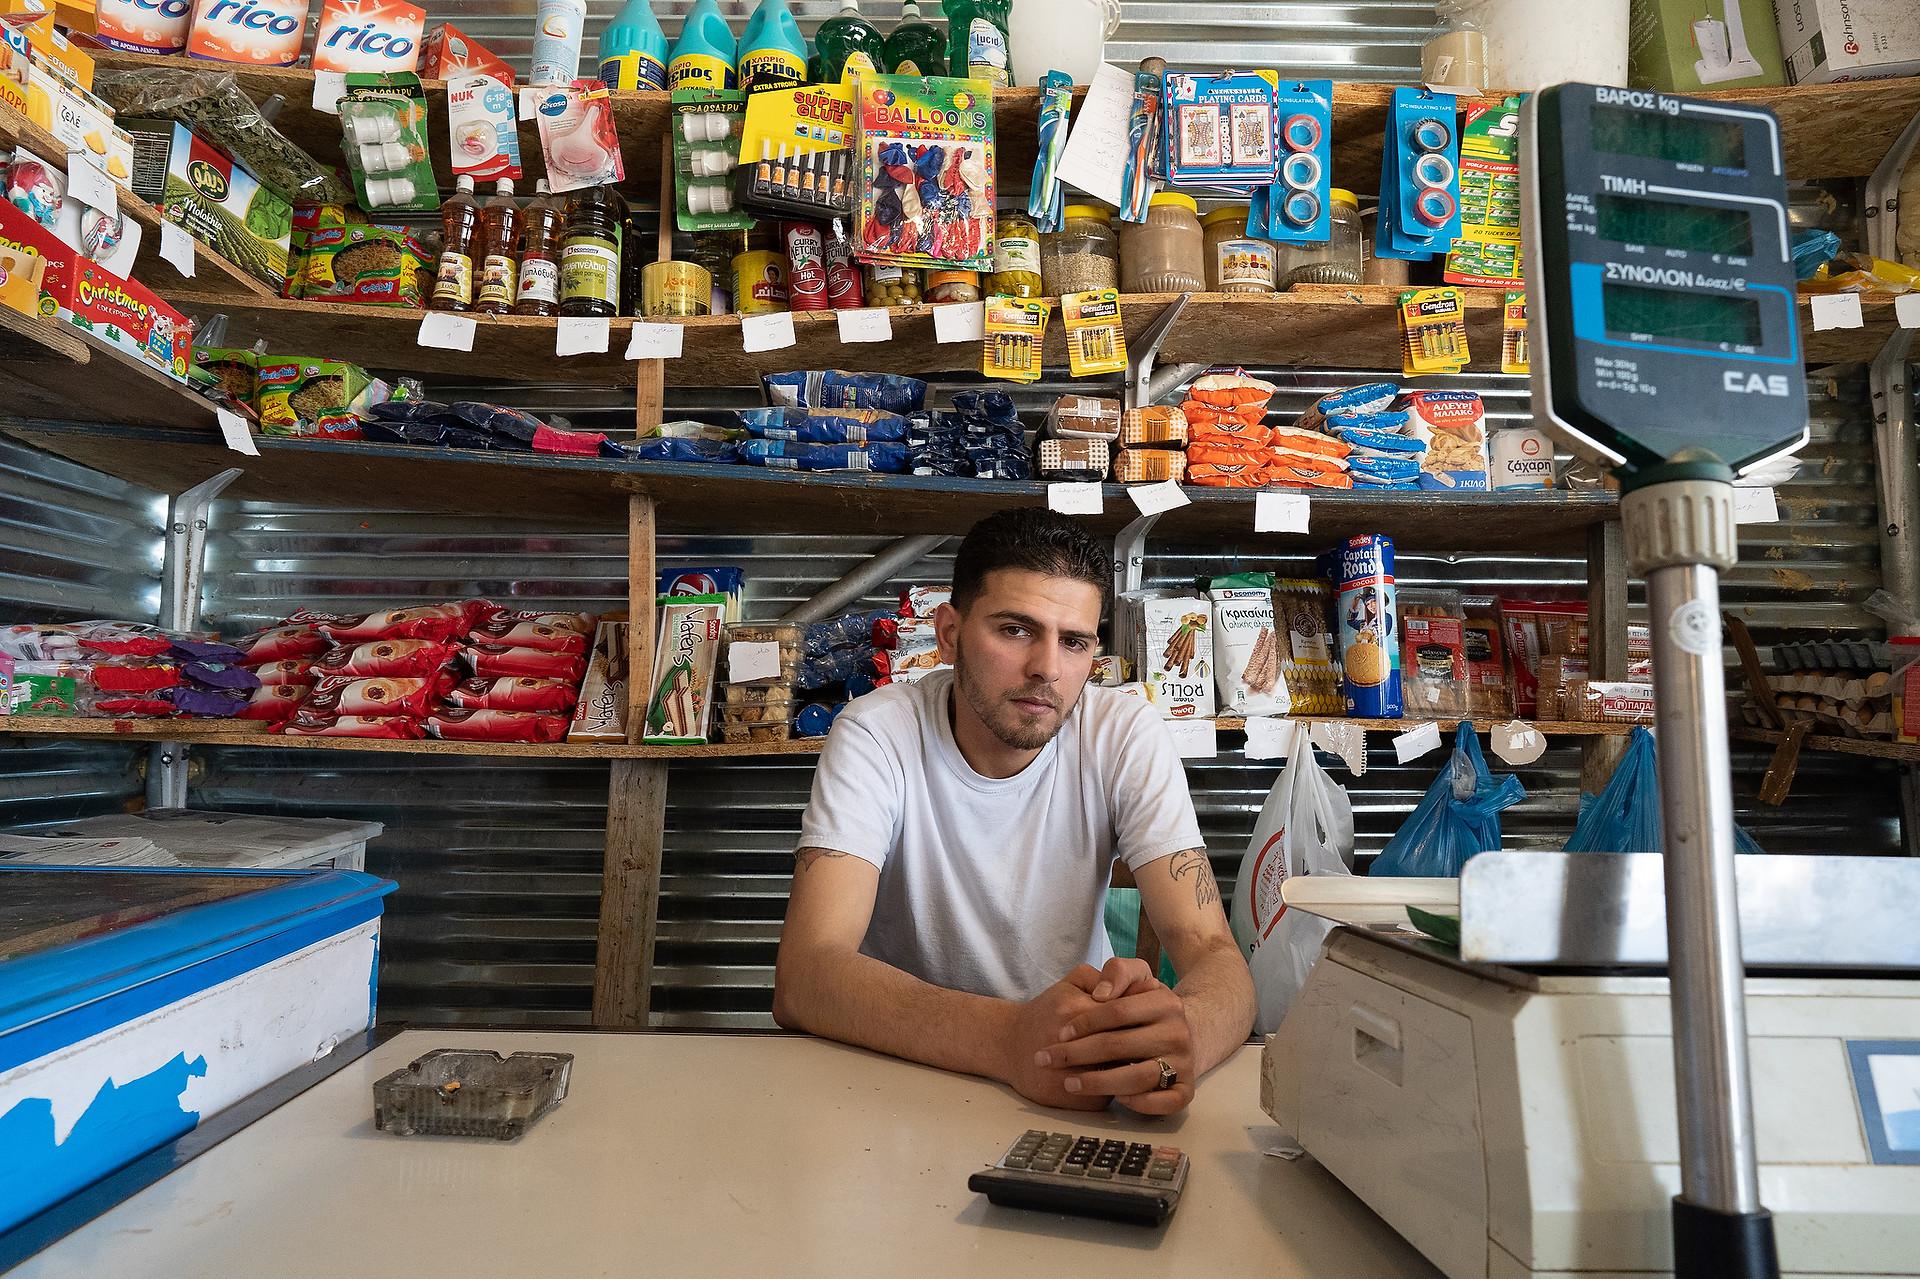 Shop life in Camp Ritsona